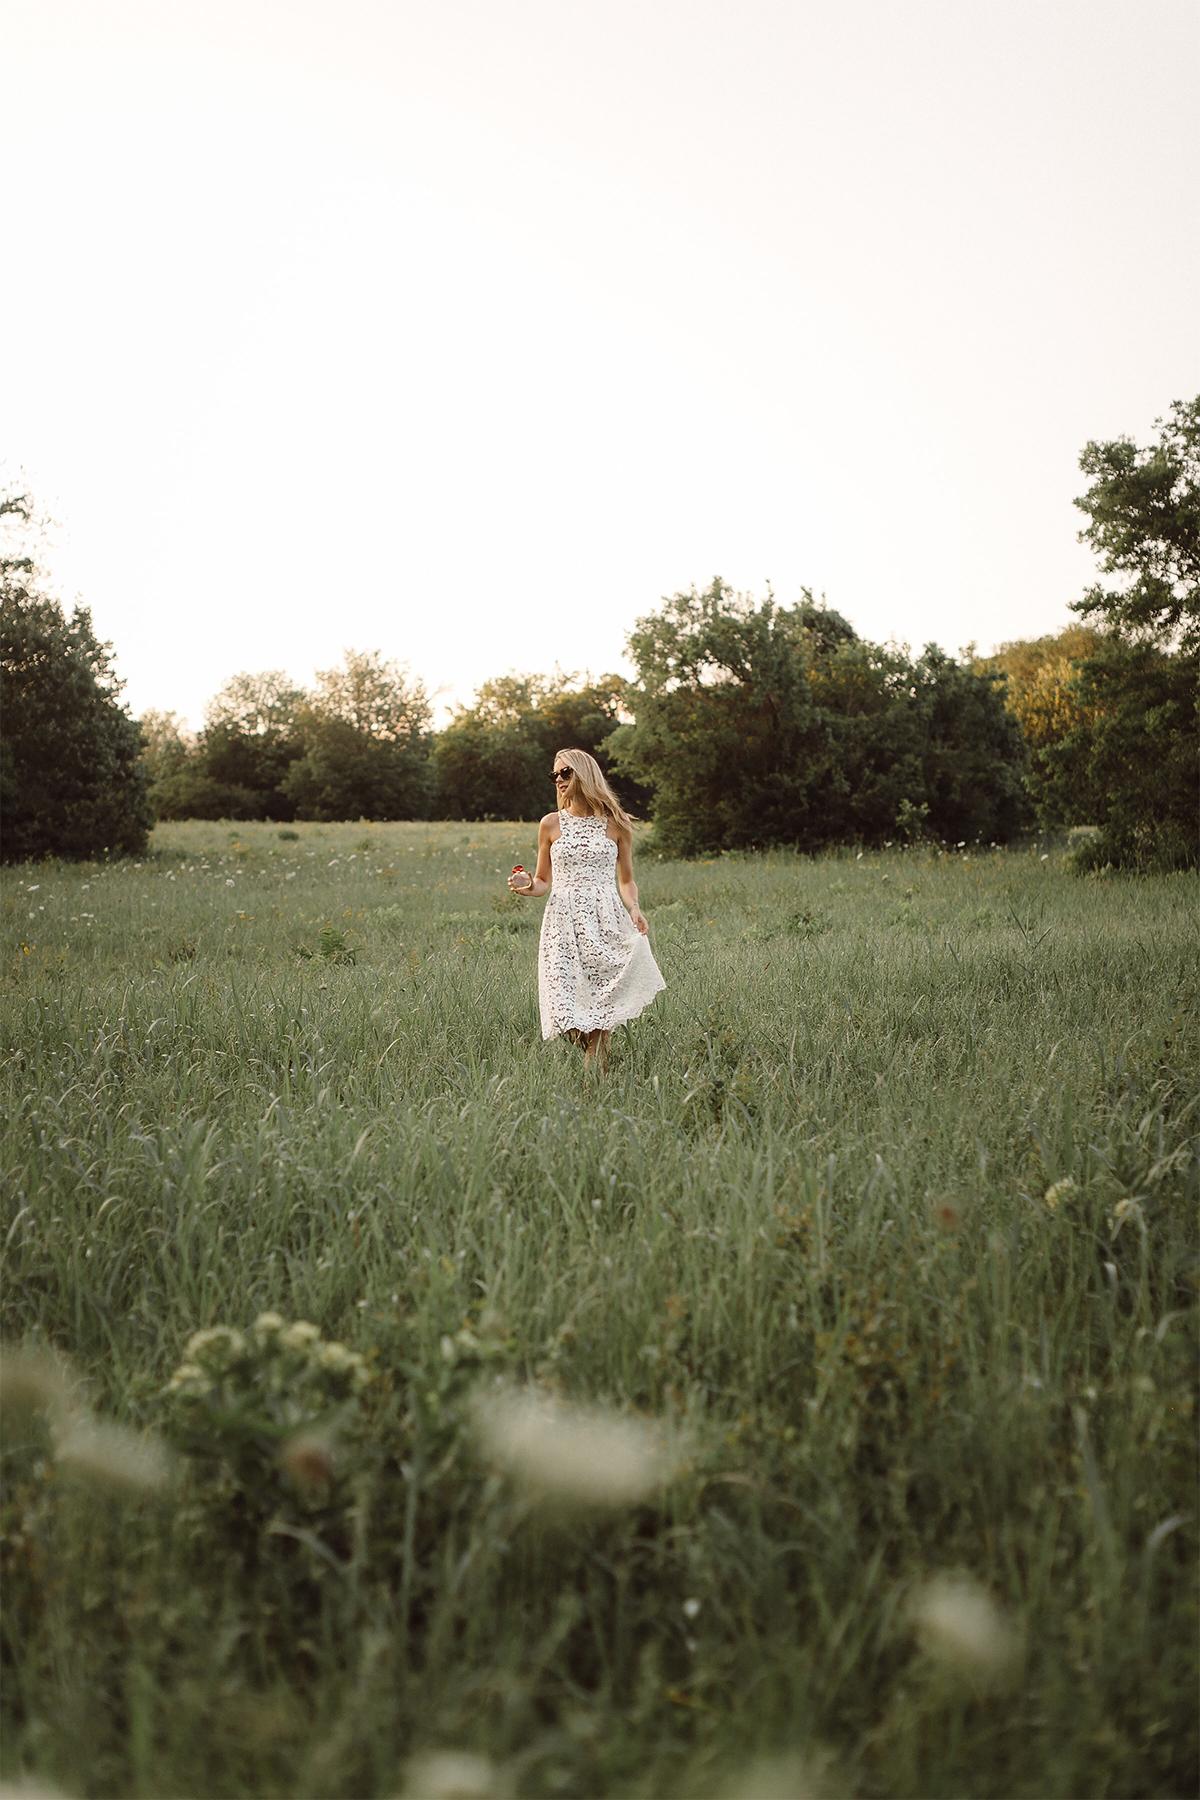 Fashion Jackson, Dallas Blogger, Fashion Blogger, Beauty Blogger, L'Occitane Terre de Lumiere Parfum, White Lace Dress